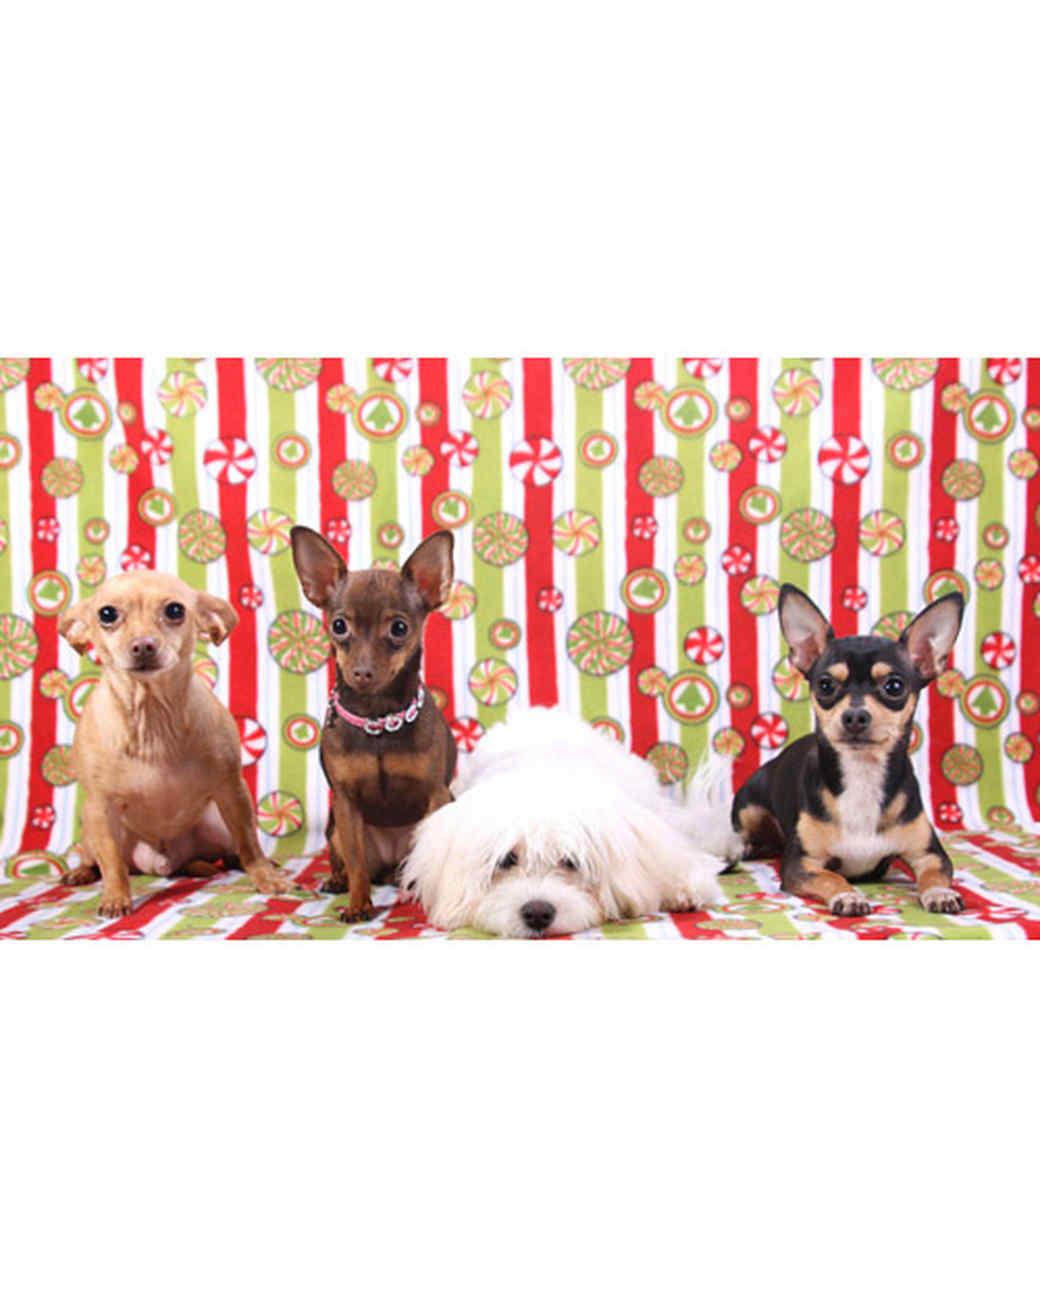 pets_santa09_6749262_10792398_main.jpg